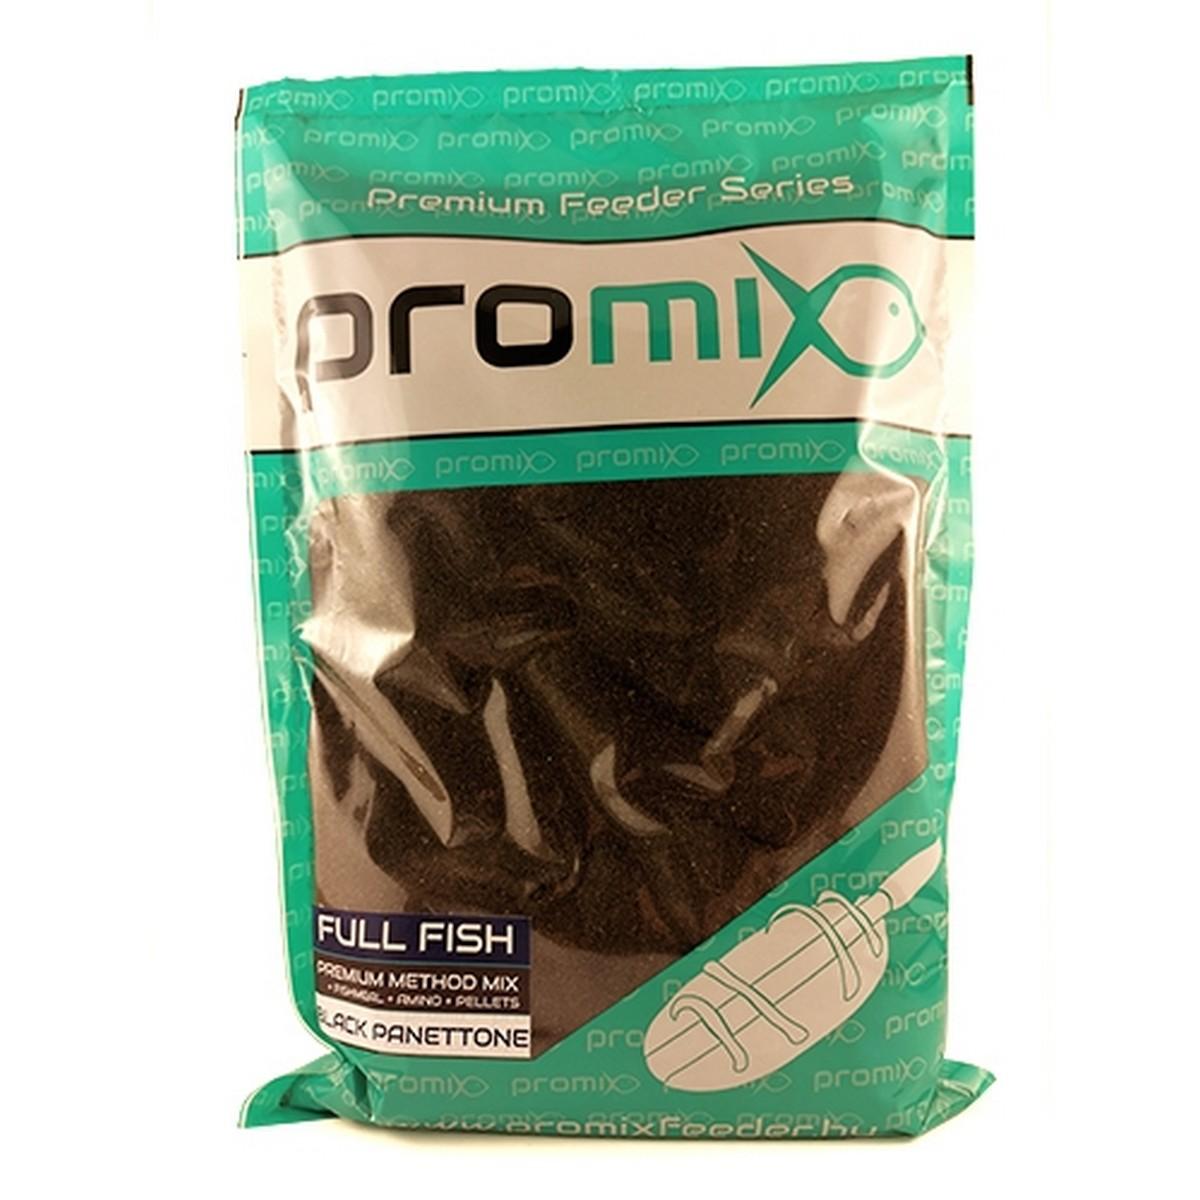 PROMIX FULL FISH METHOD MIX BLACK PANETTONE